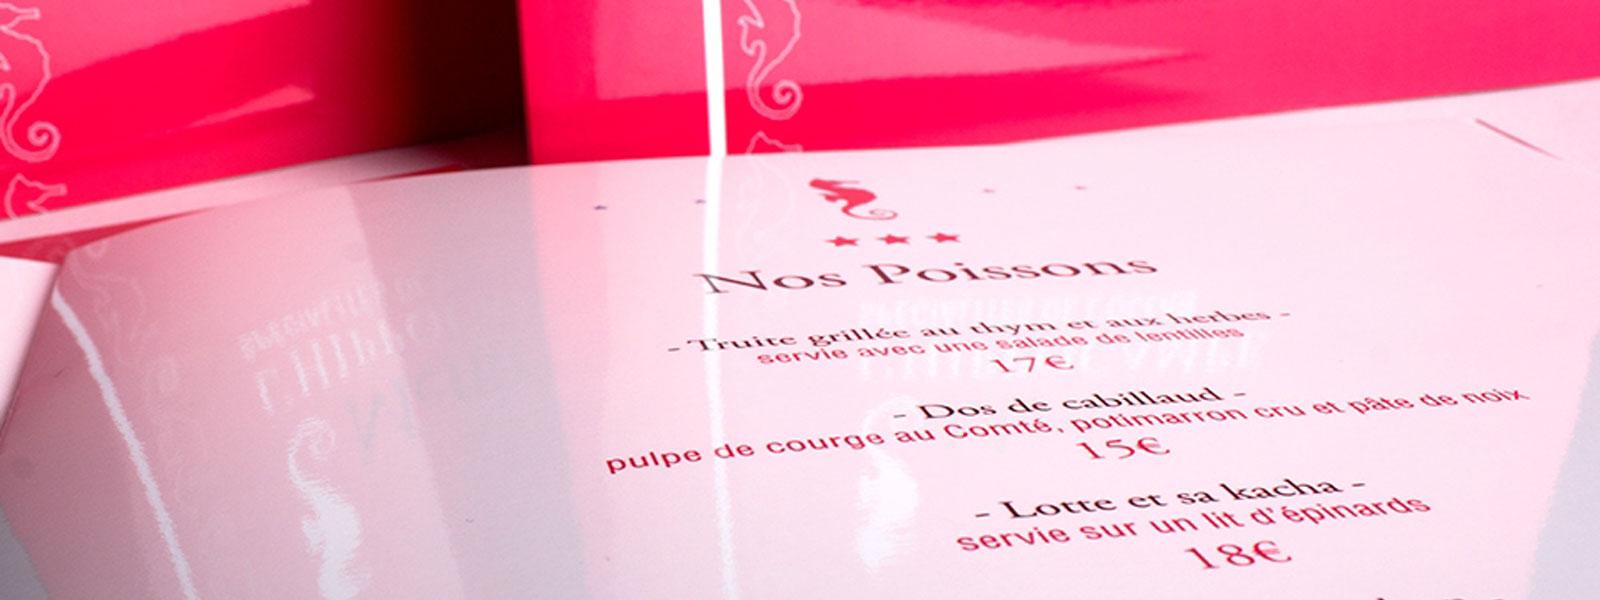 menu restaurant qualité